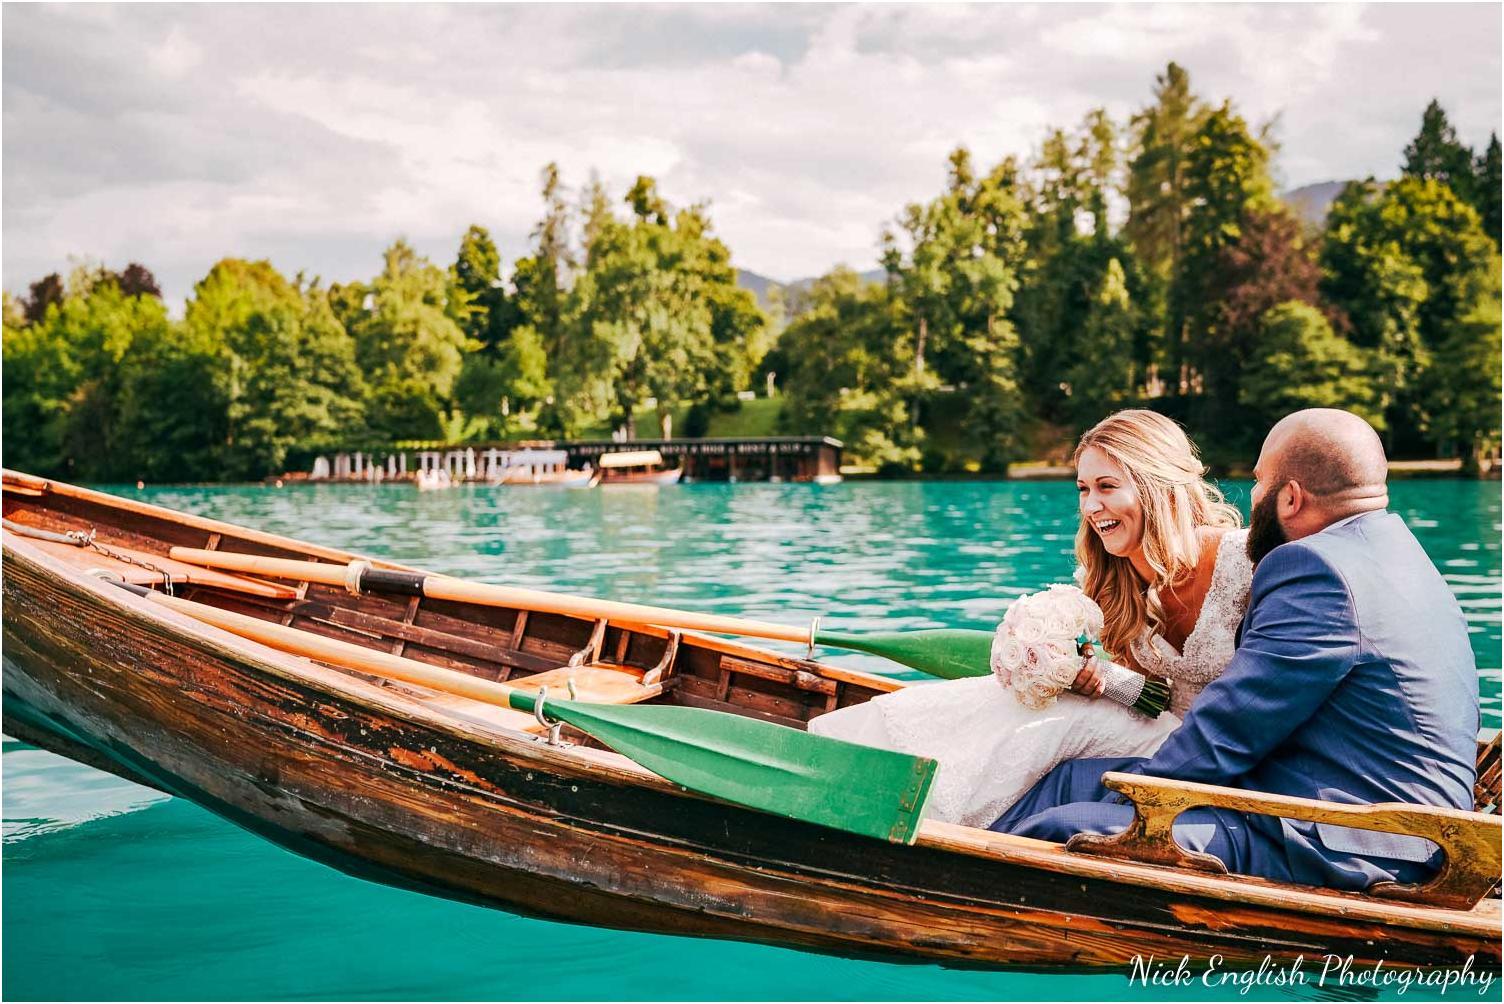 Lake_Bled_Destination_Wedding_Photographs-1.jpg